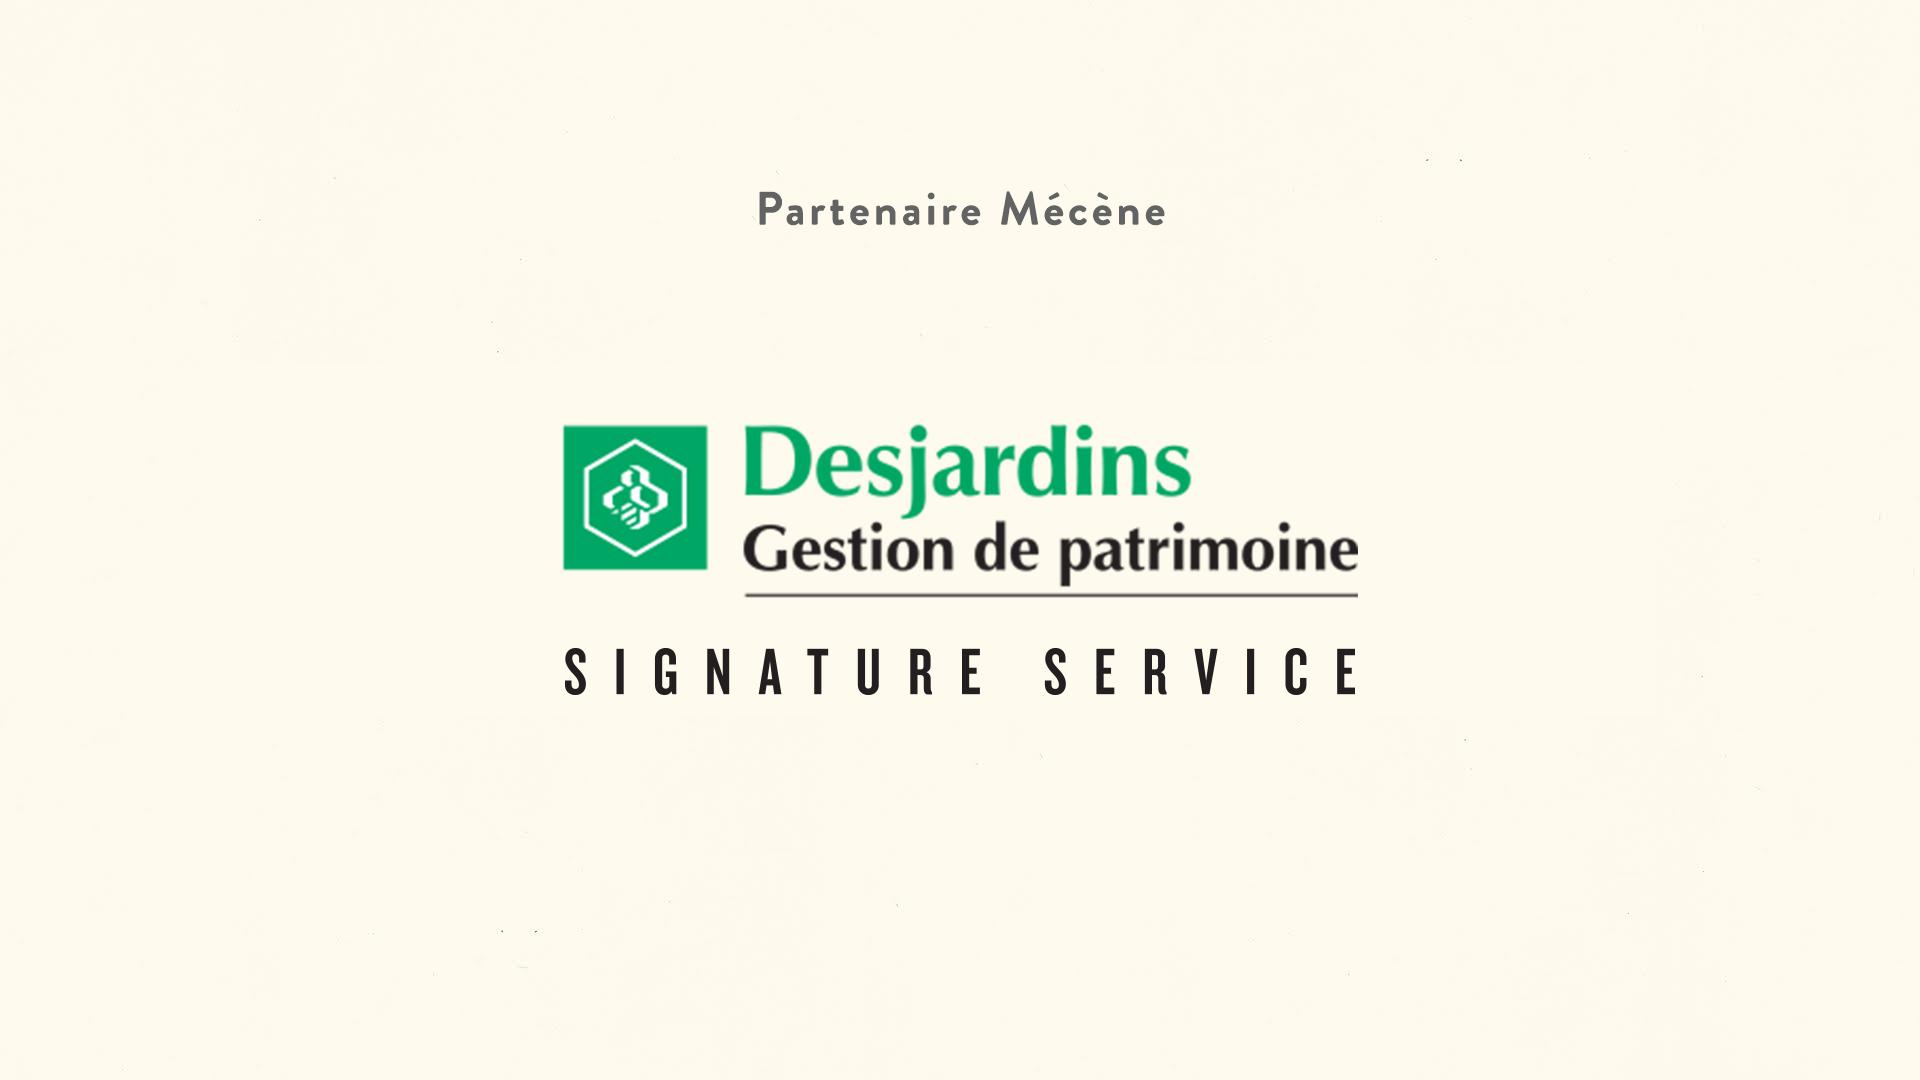 Service Desjardins Signature.png